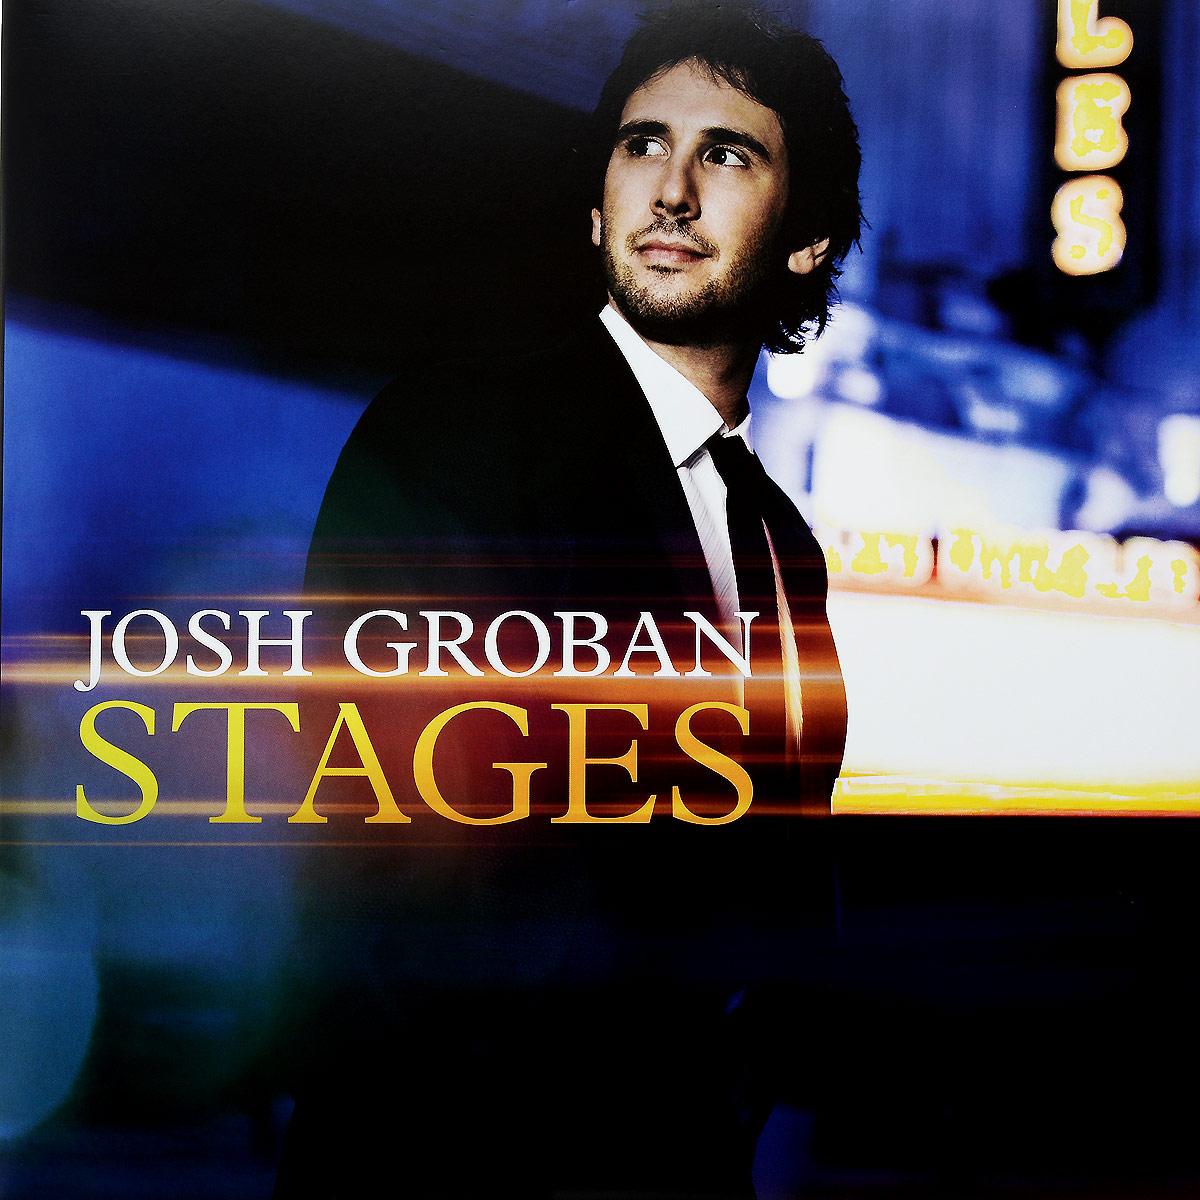 Джош Гробан Josh Groban. Stages (2 LP)